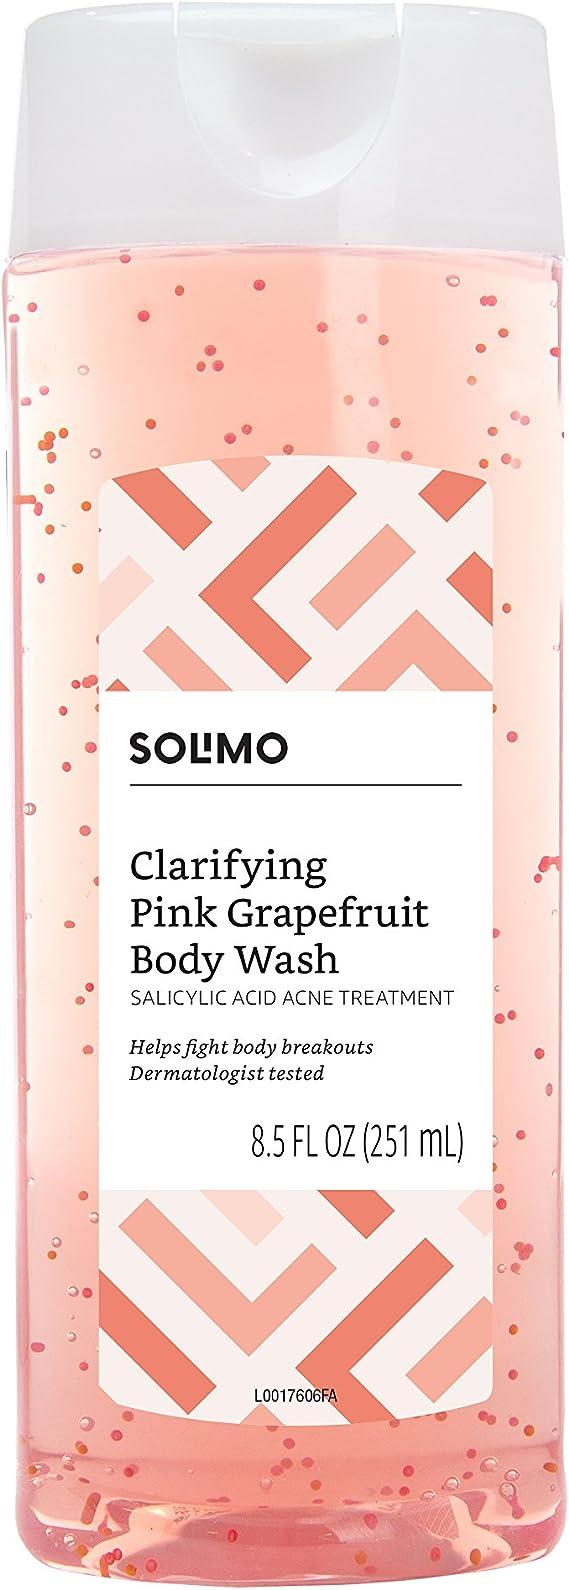 Amazon Brand - Solimo Clarifying Pink Grapefruit Body Wash